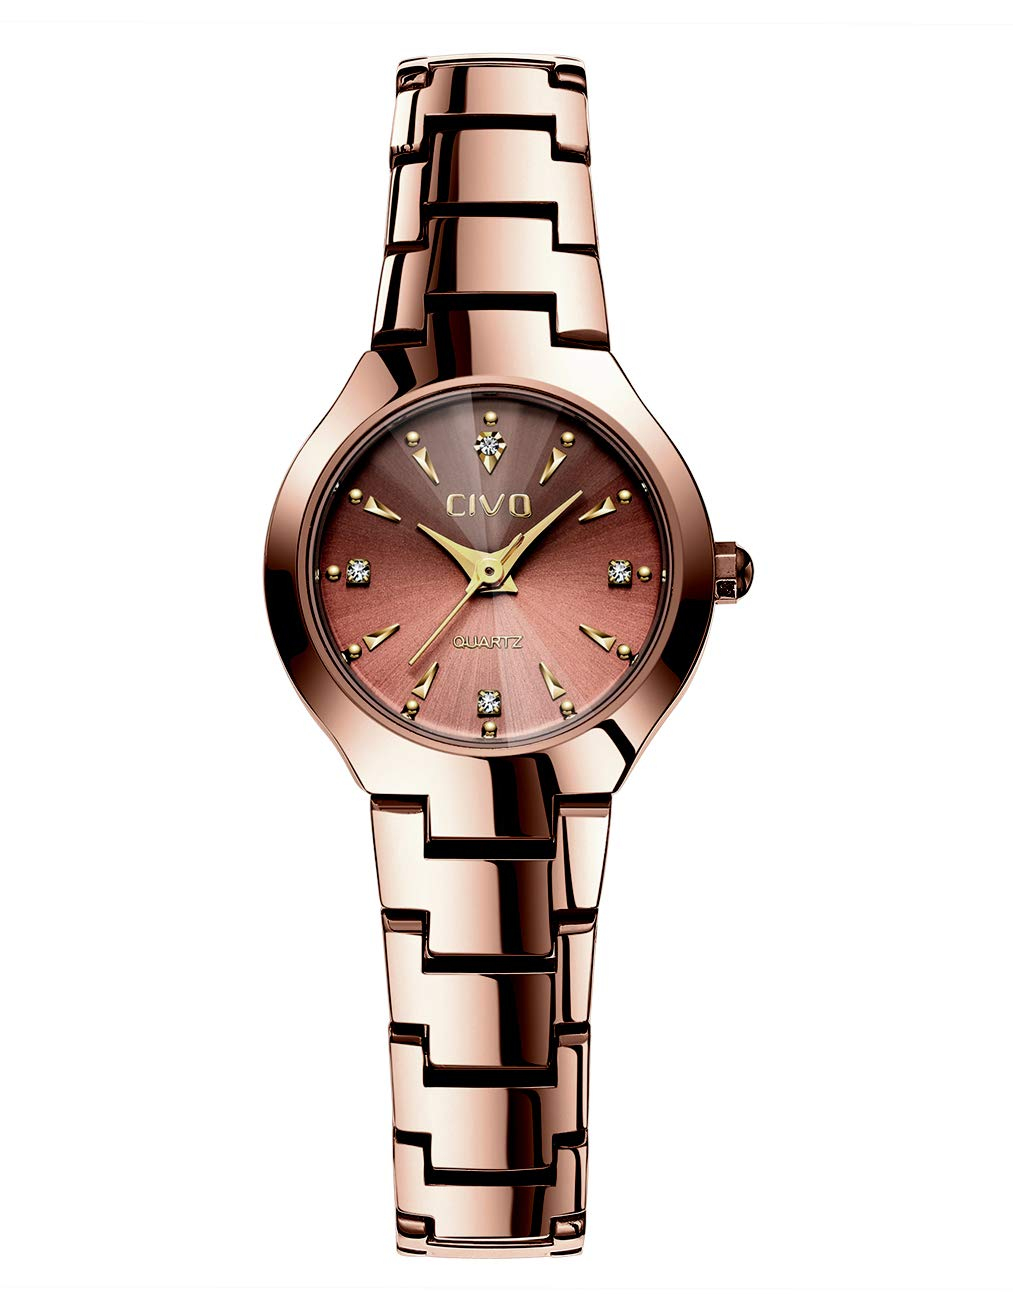 CDM product CIVO Women's Watches Ladies Waterproof Watch Stainless Steel Mesh Analog Quartz Wrist Wacthes for Woman Fashion Simple Minimalist Dress Elegant Design big image